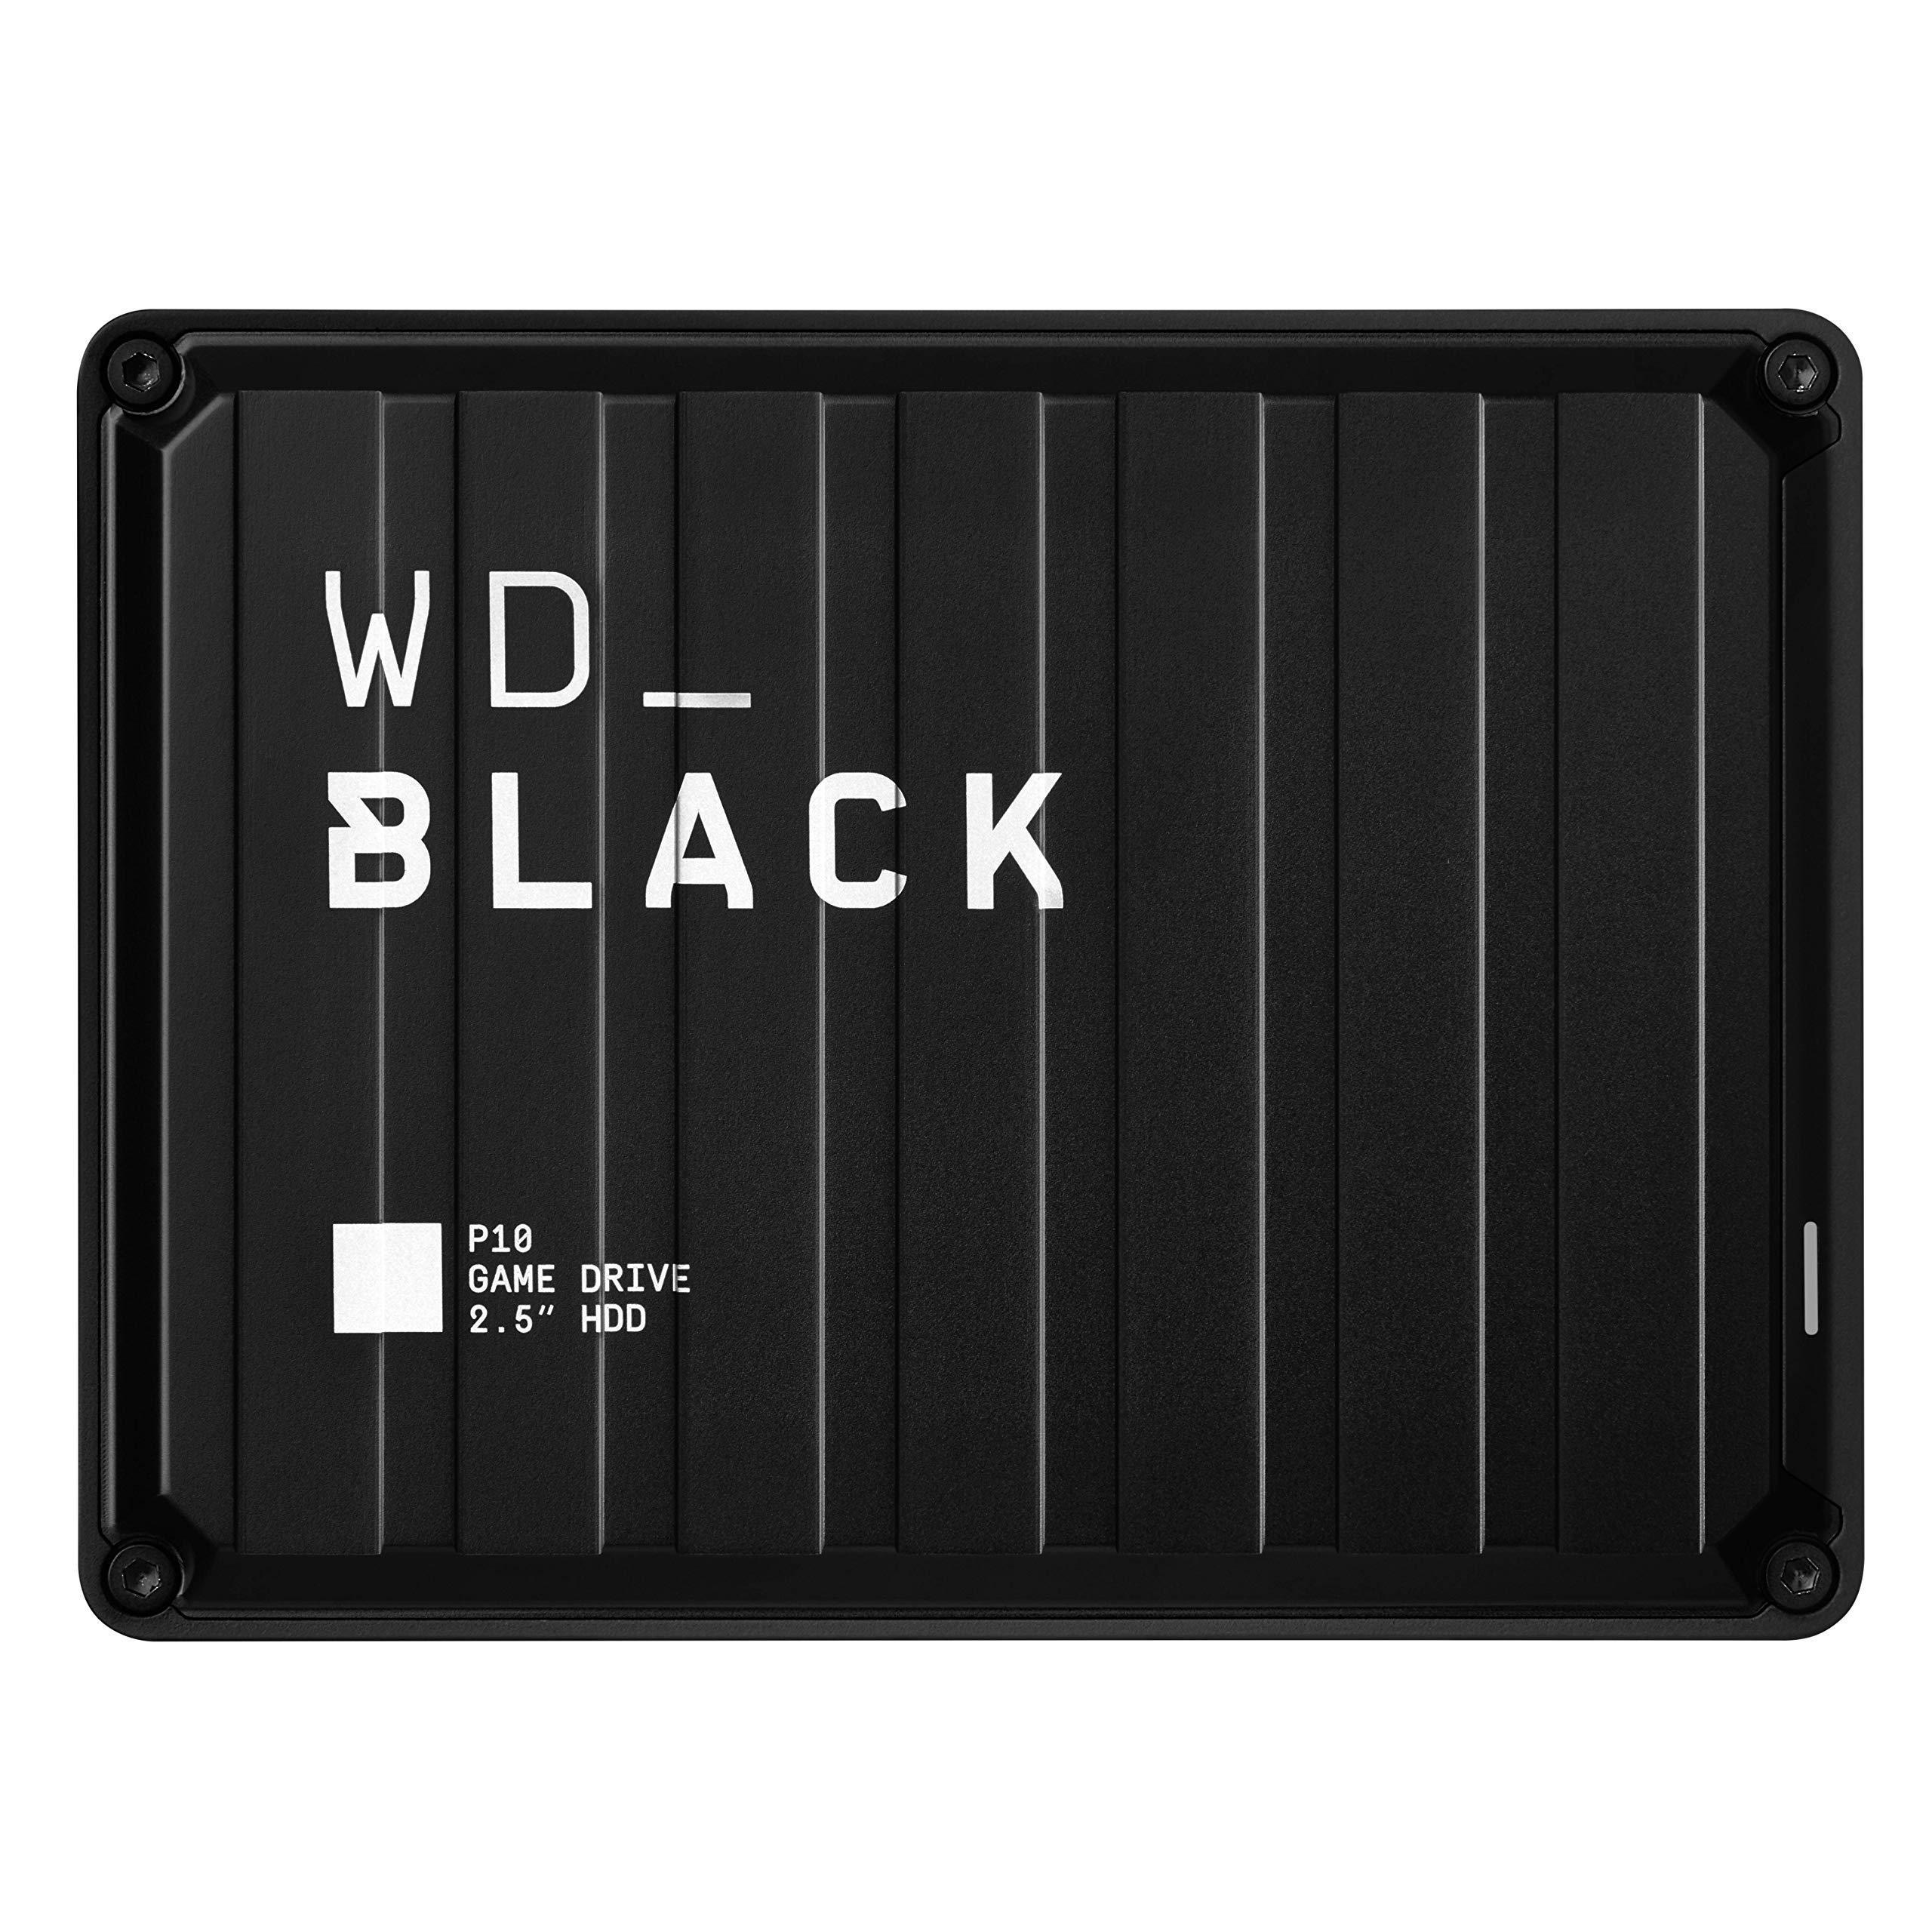 WD_Black Drive External Compatible WDBA3A0050BBK WESN